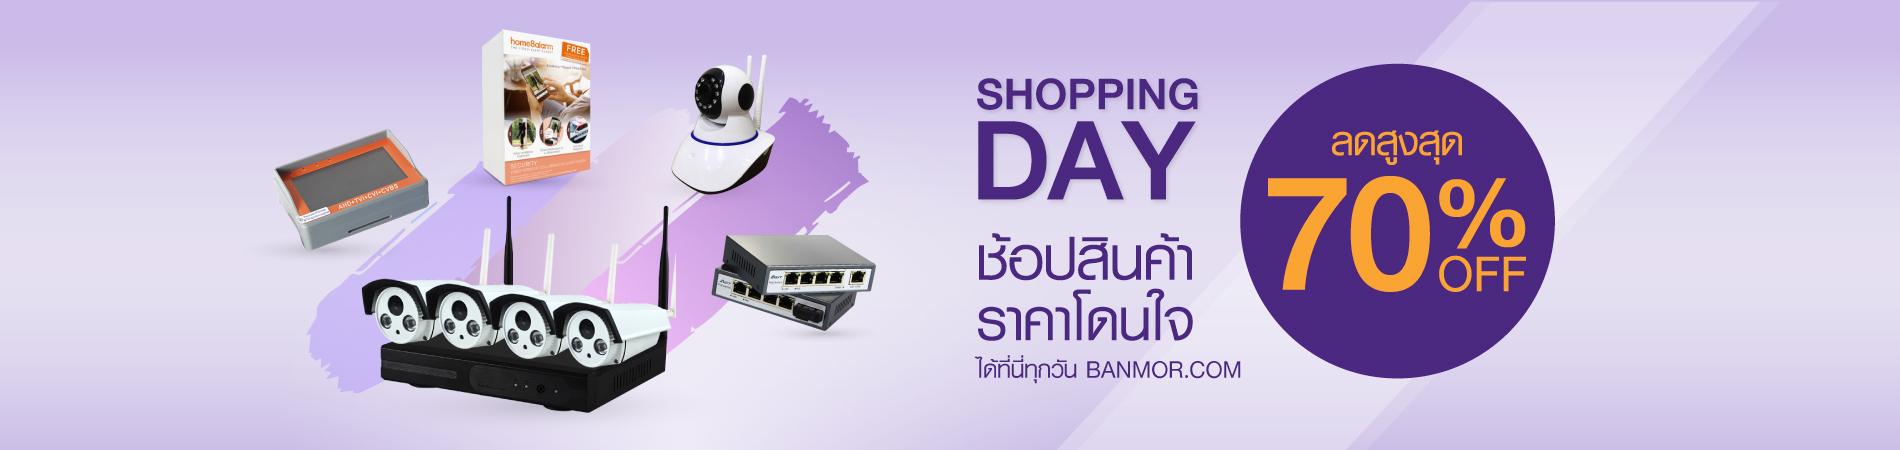 shopping-day-ลดสงสุดมากถึง 70%